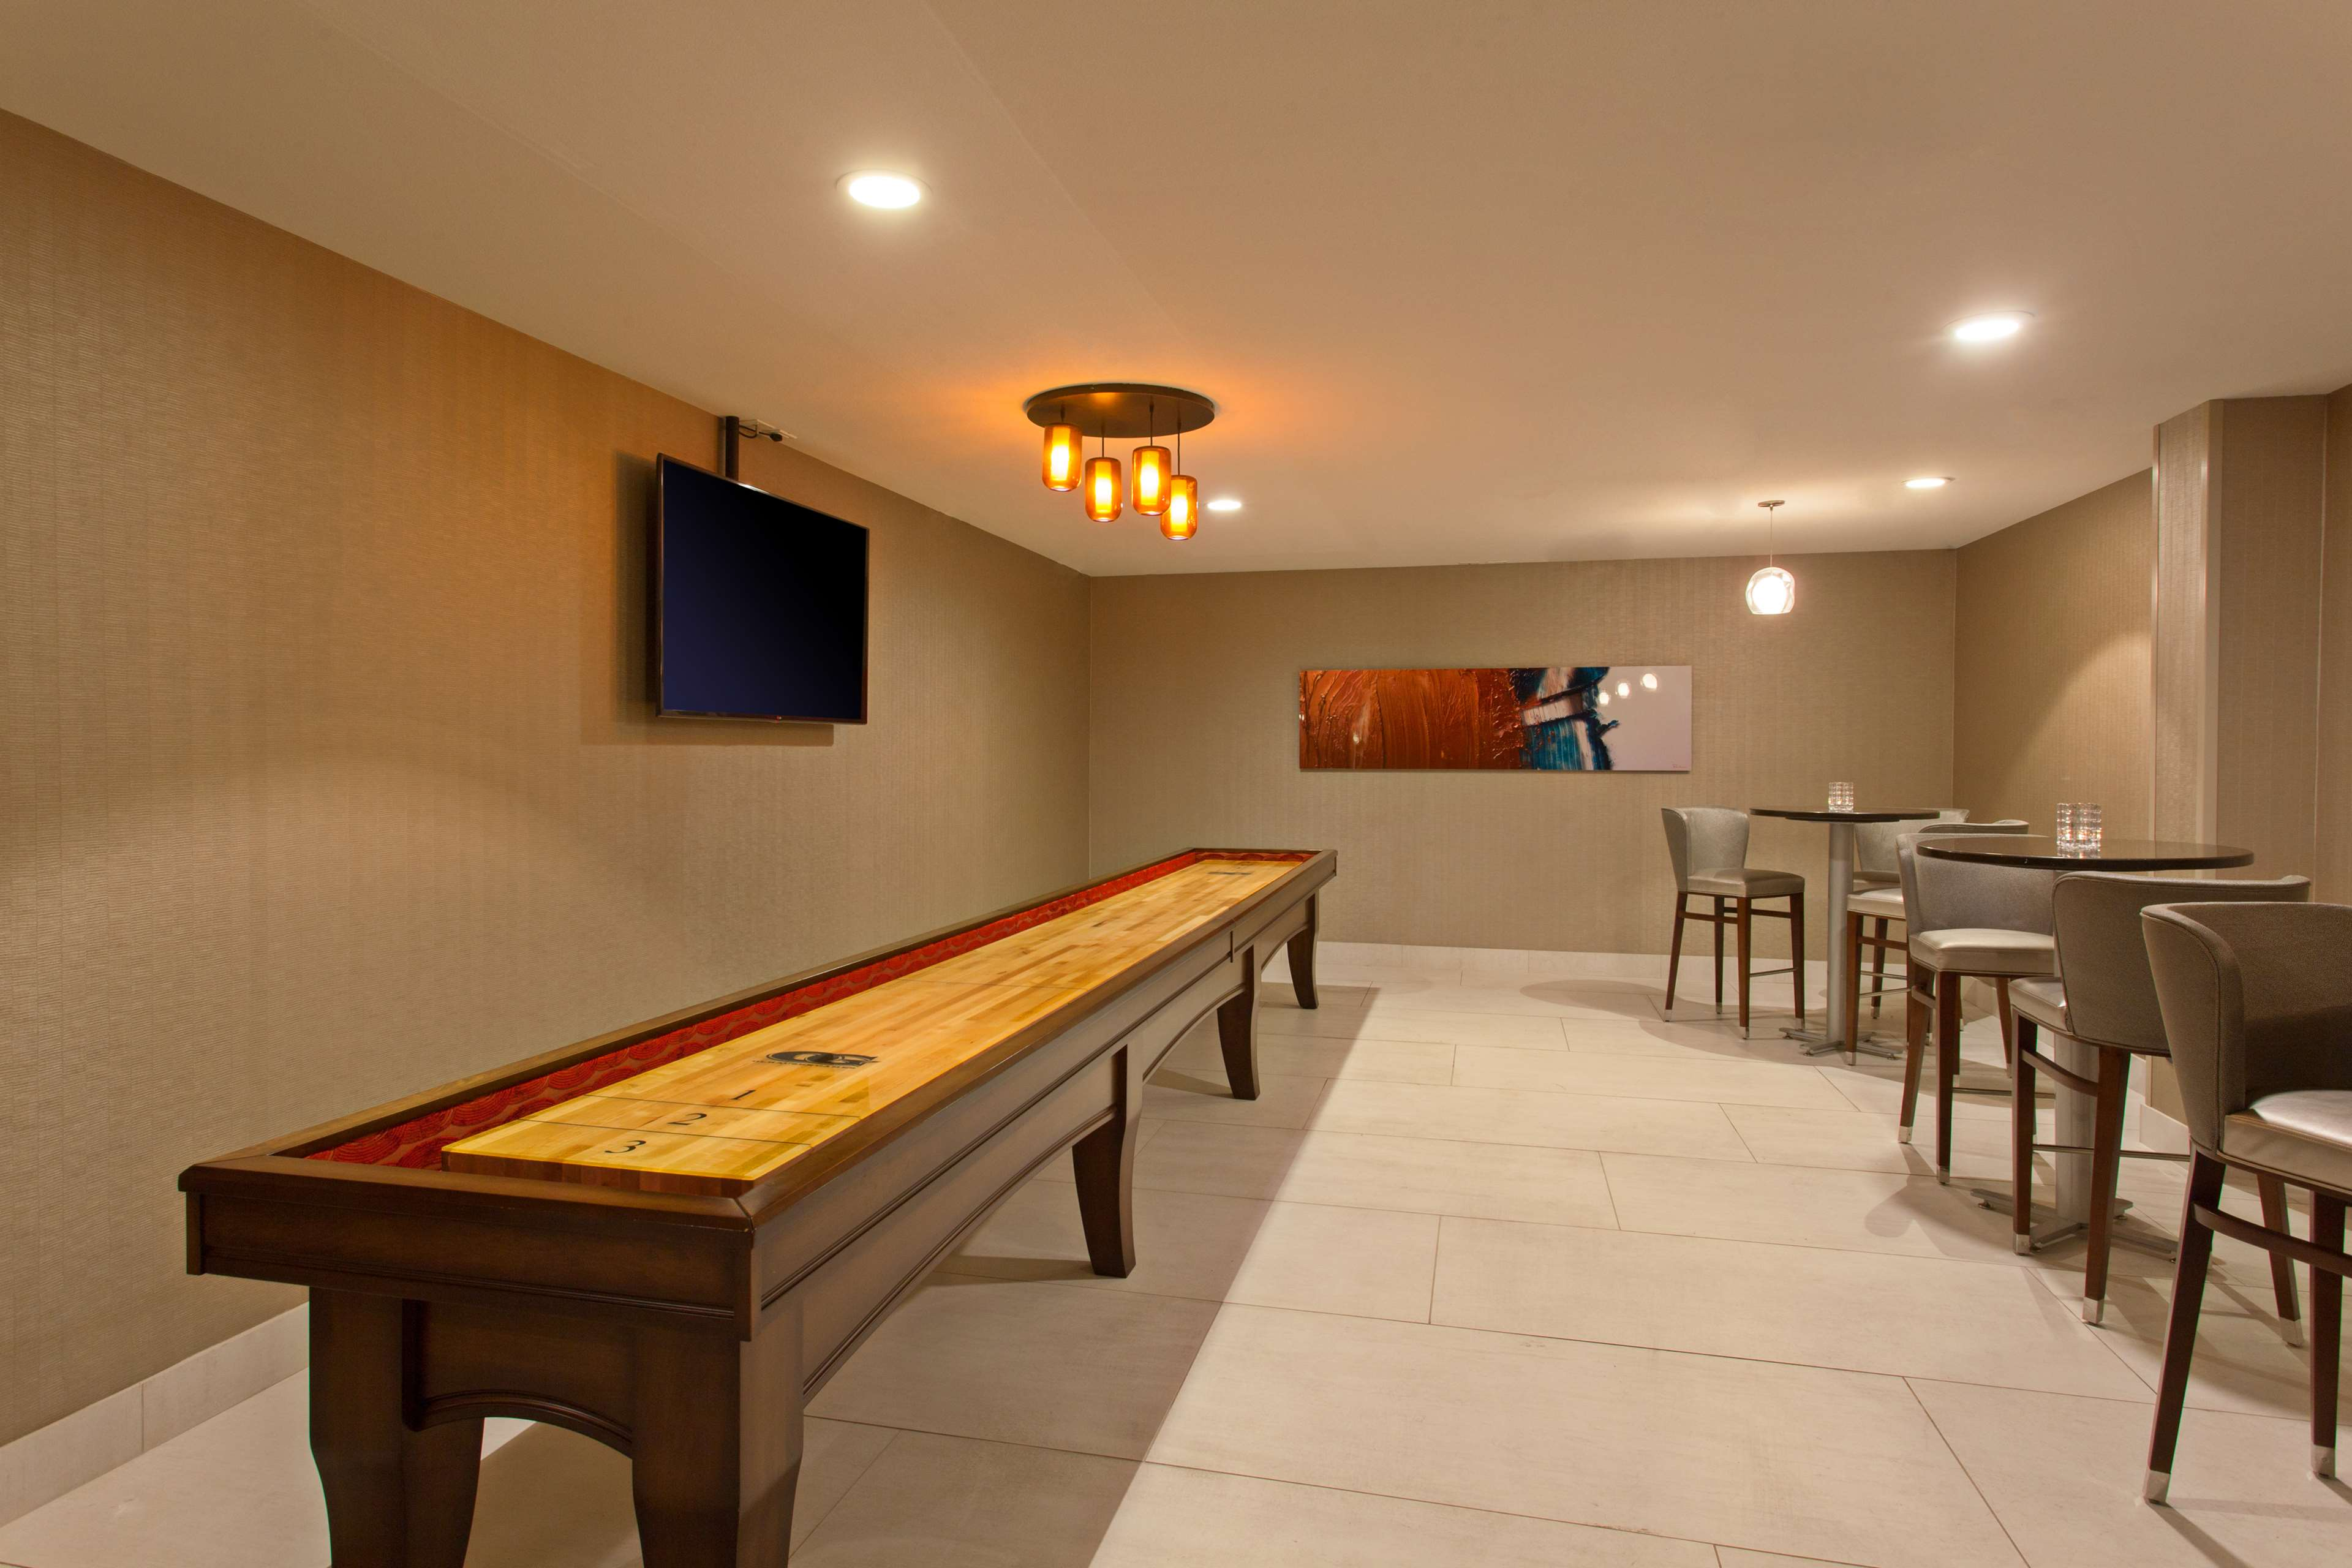 DoubleTree by Hilton Hotel San Bernardino image 16